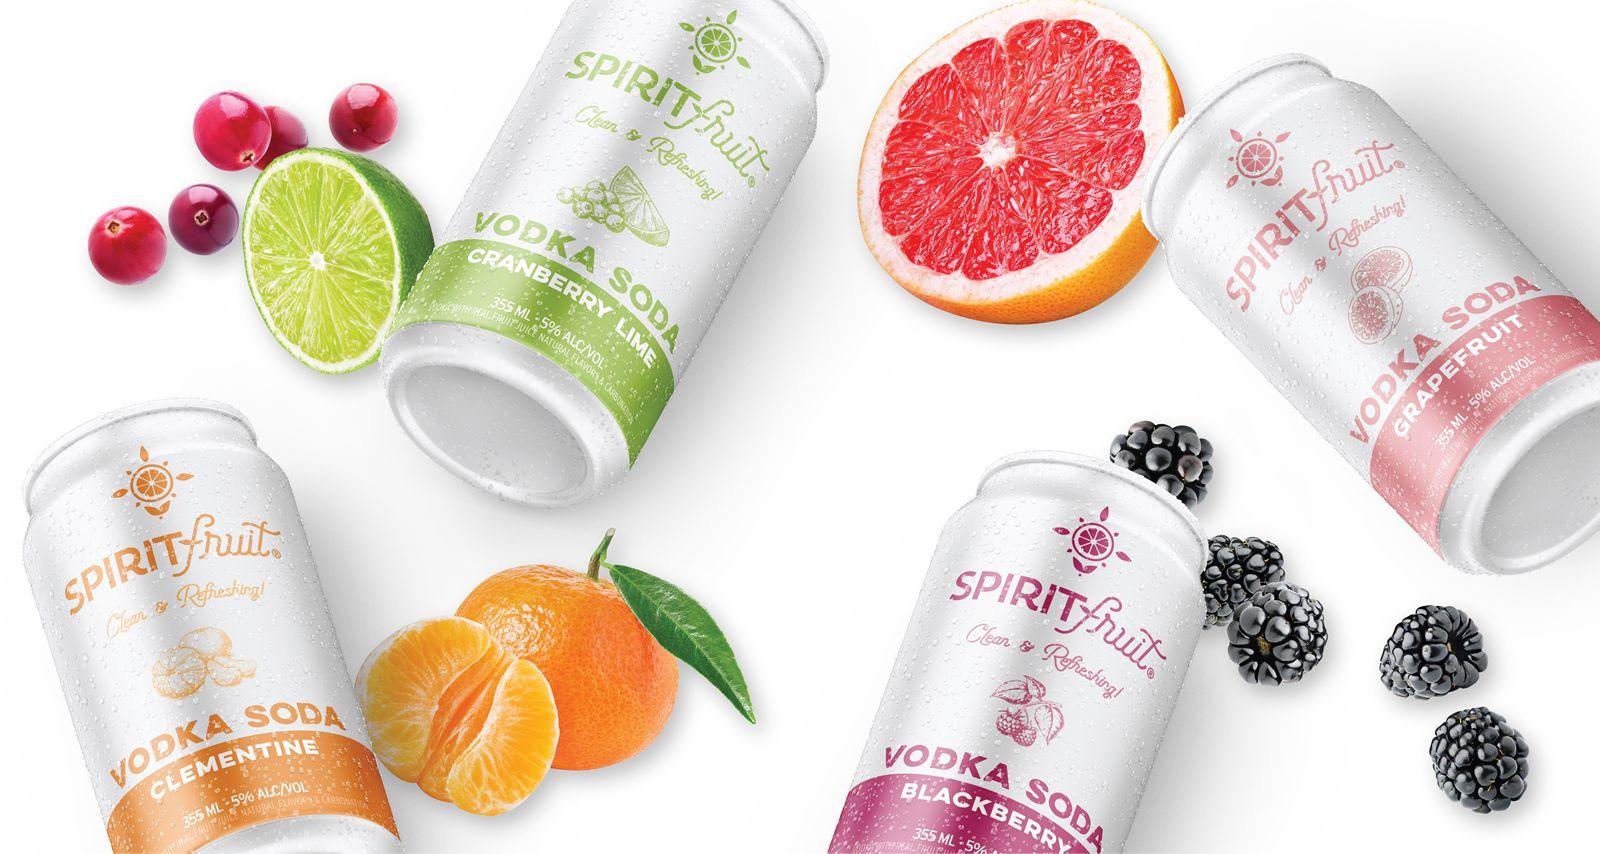 Jeff Glennon Appointed COO at Spiritfruit Vodka Soda